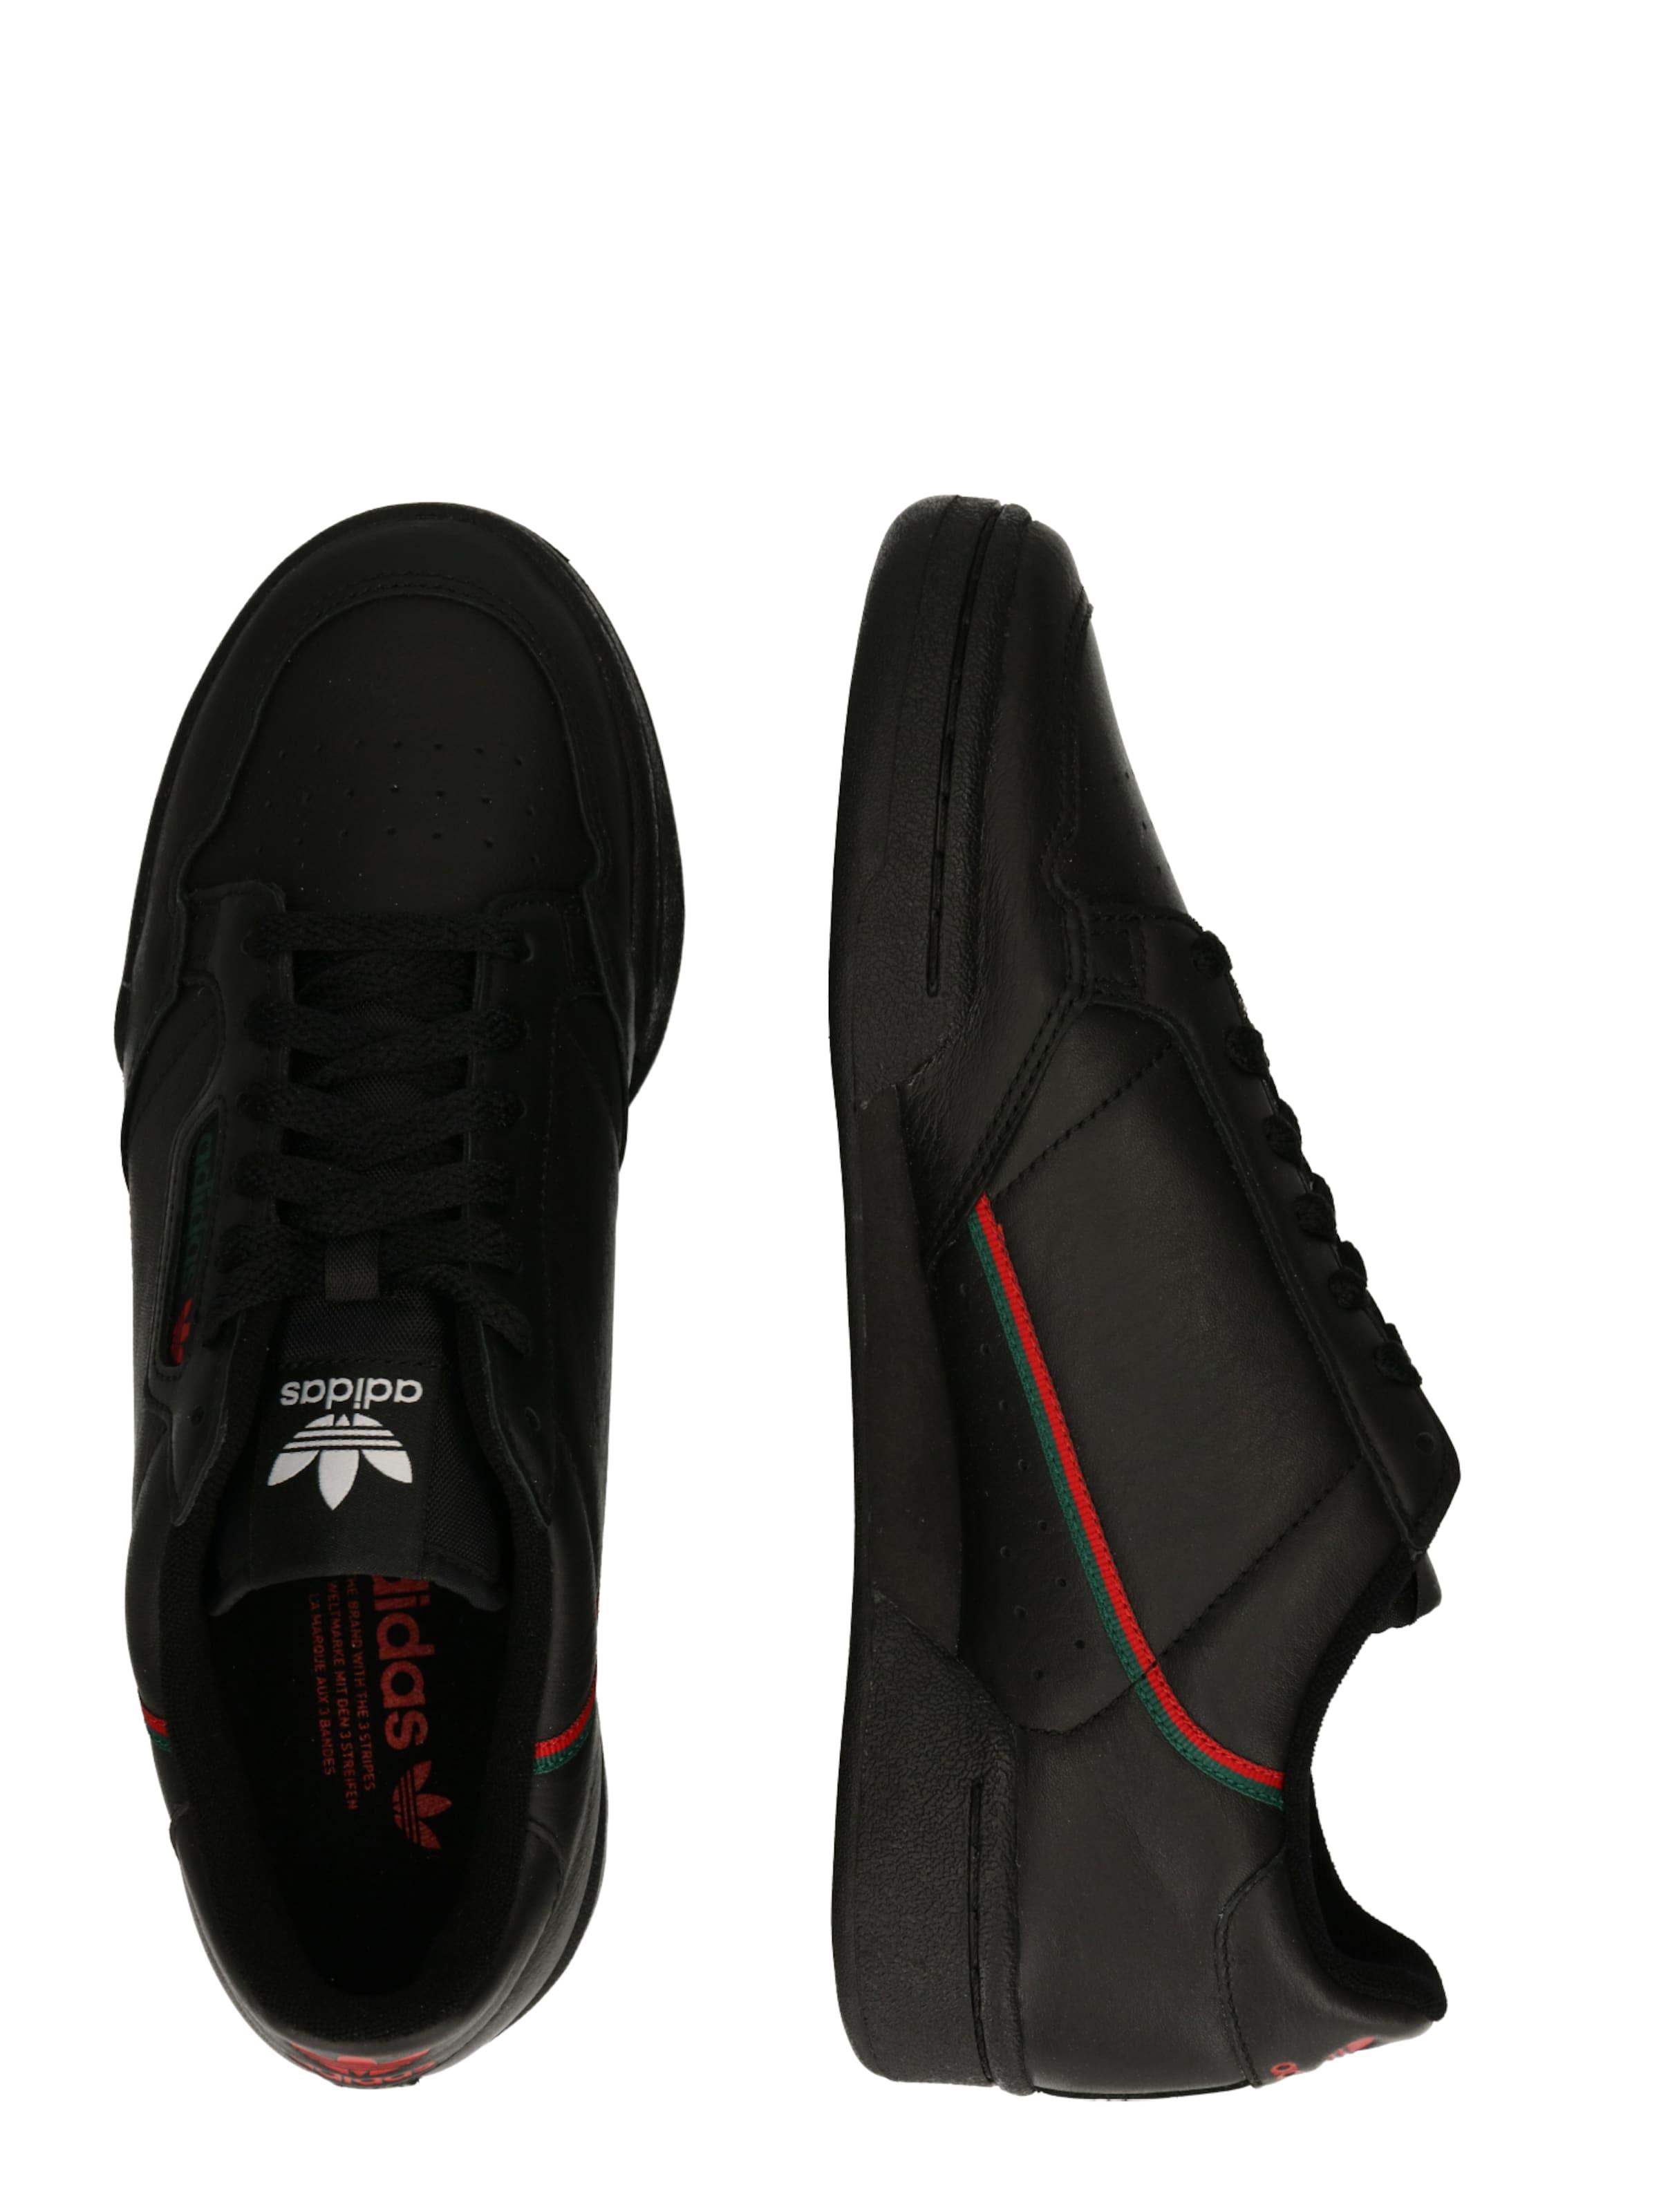 Adidas Weiß GrünRot In Schwarz Originals Sneaker 'continental 80' 3j5LAc4Rq